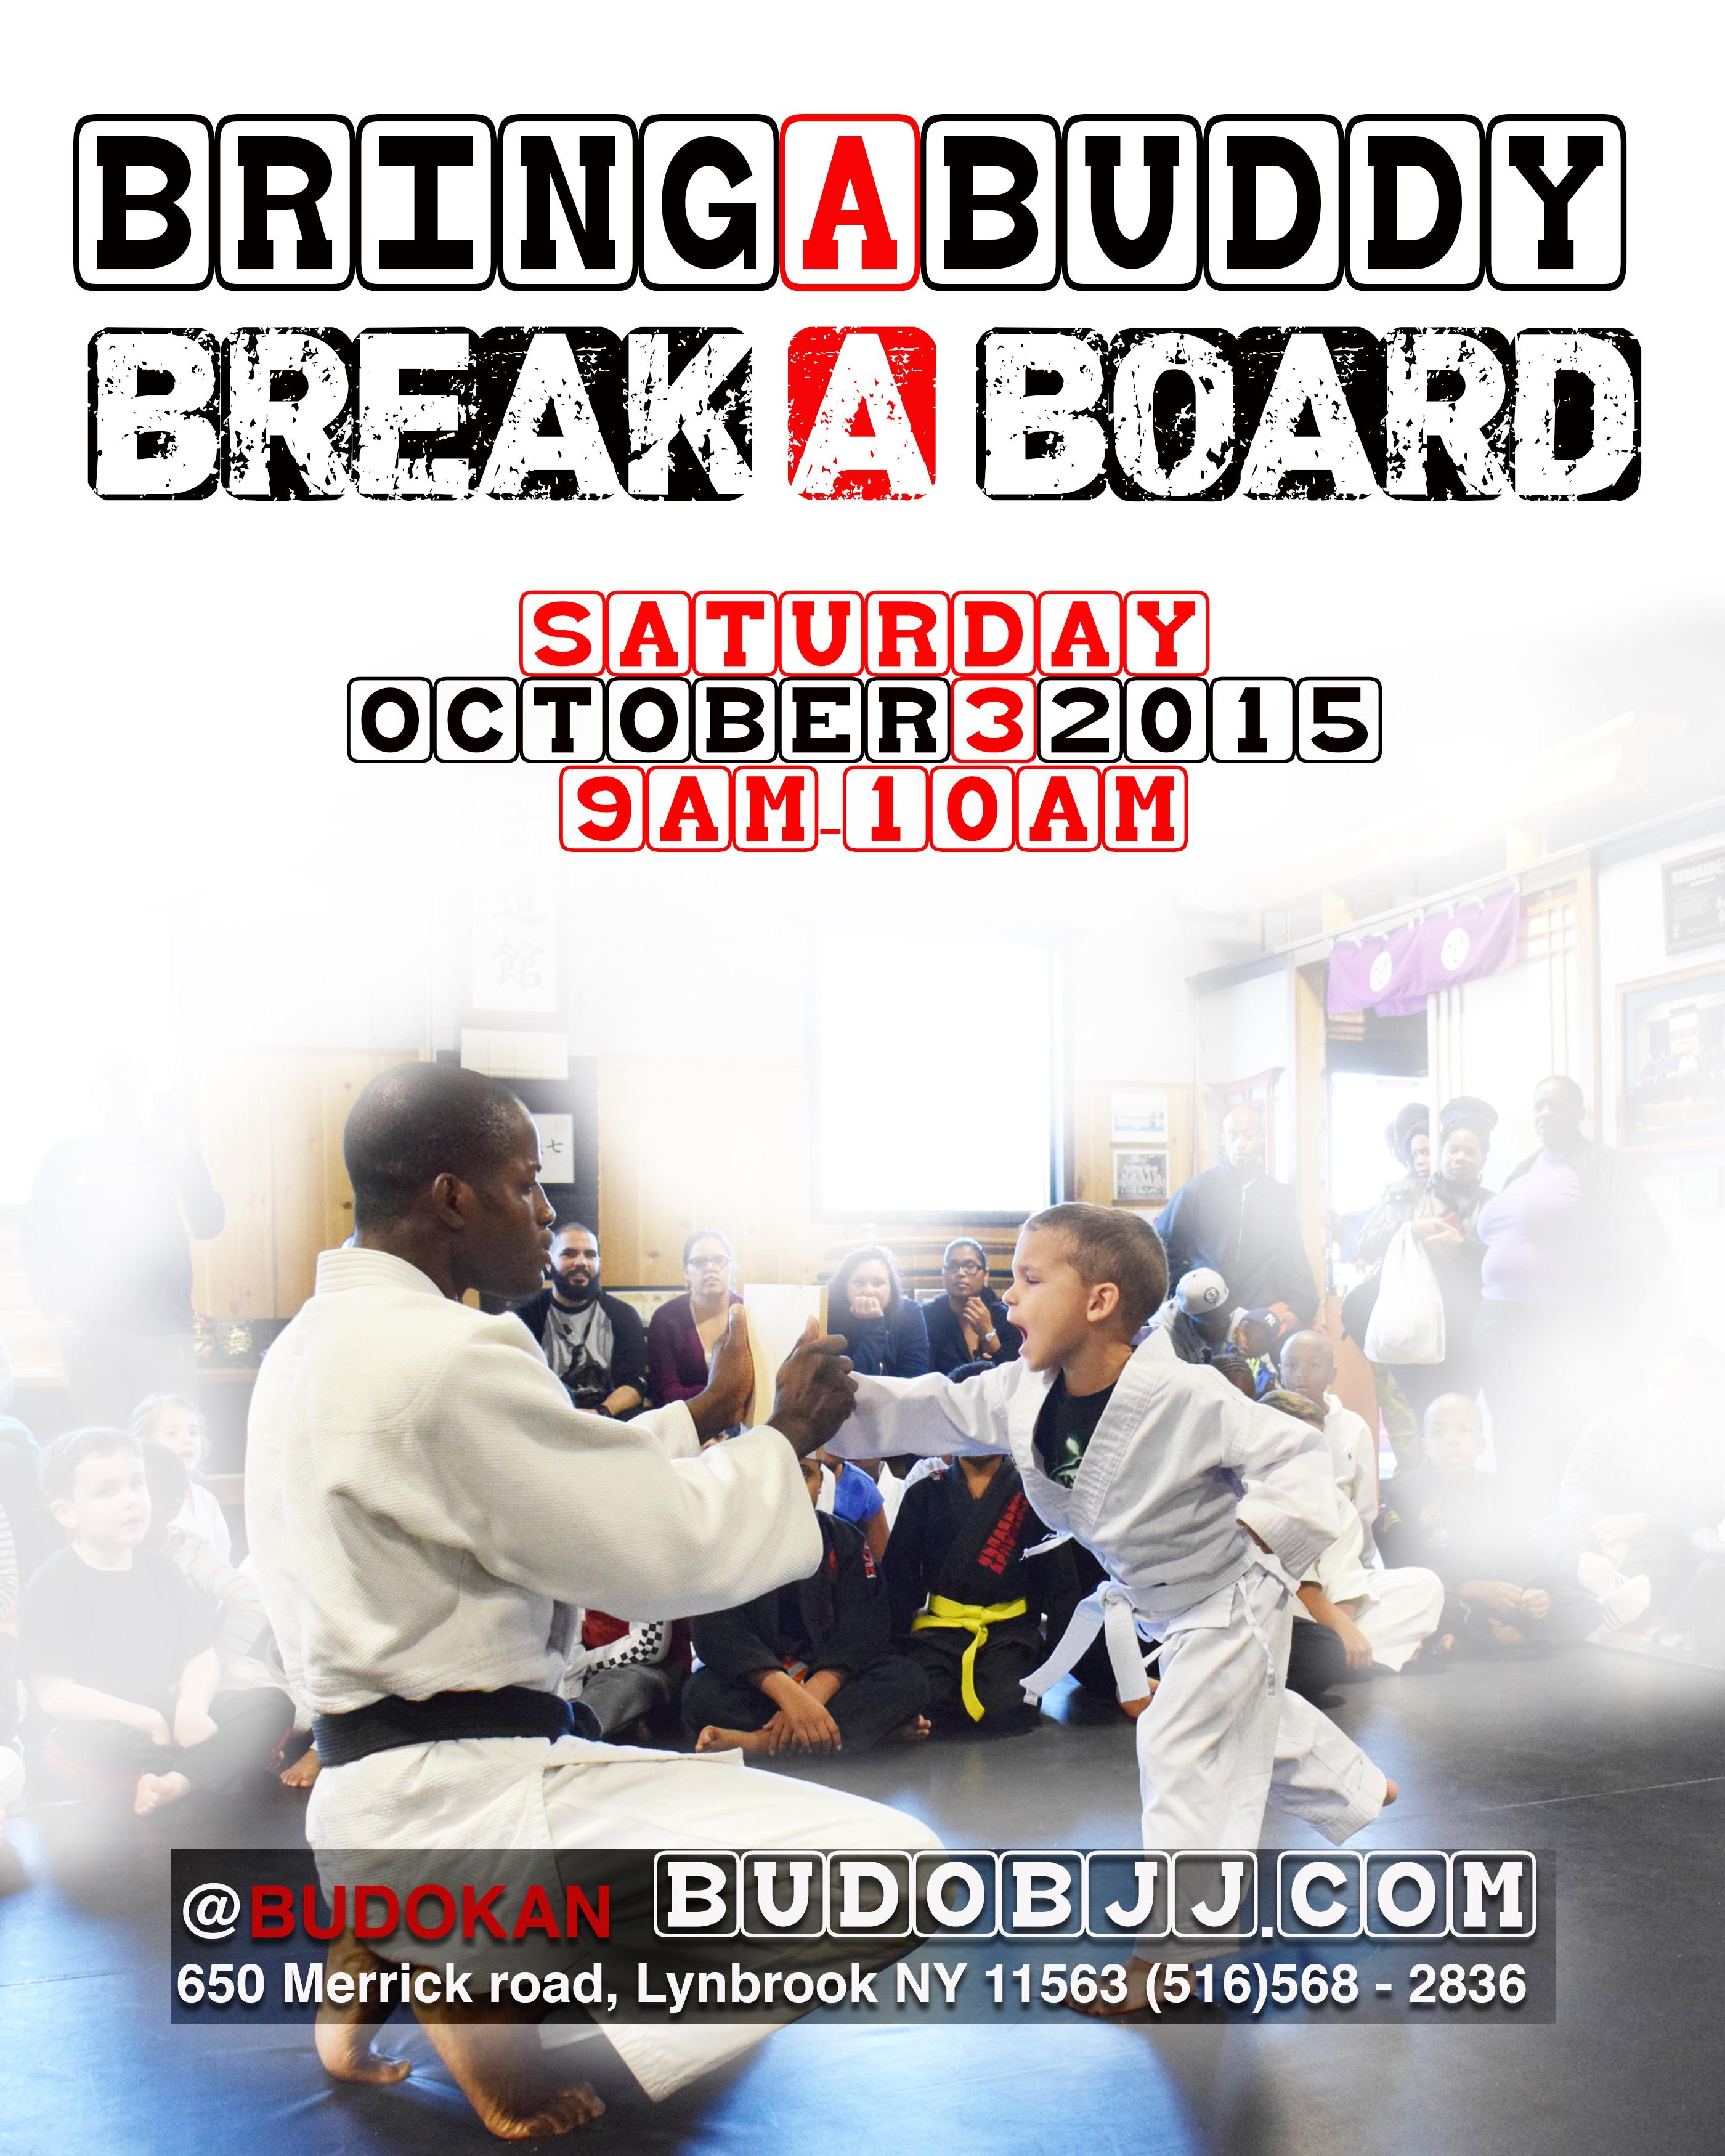 Www Budobjj Com Budokan Martial Arts Page 10